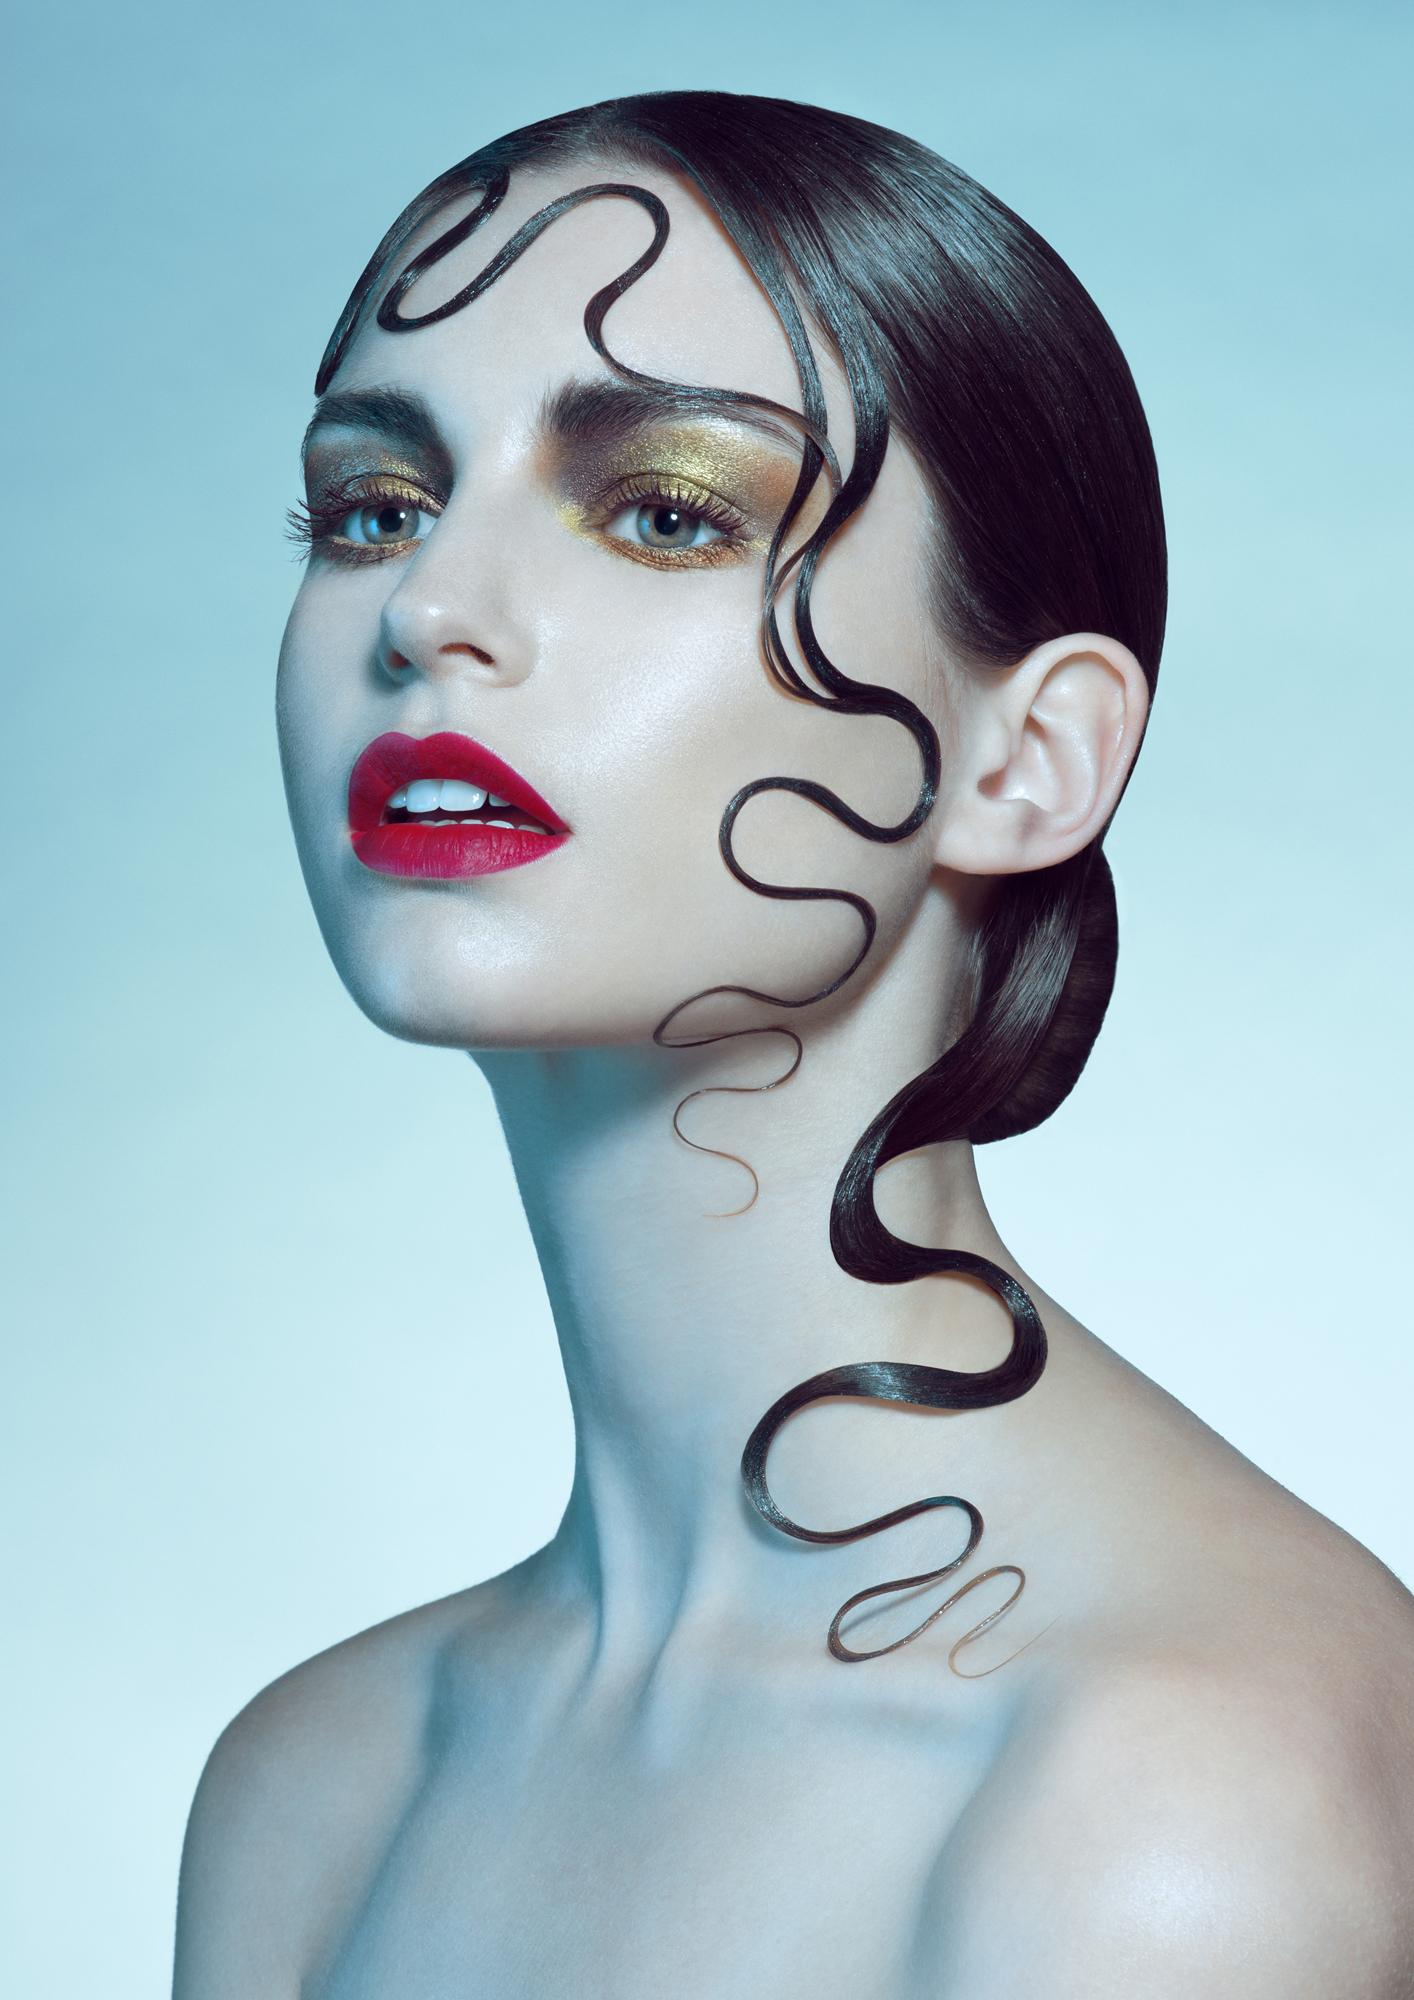 Joanna Kustra Photography - Vanessa Grasse @ MandP Models - h Kasia Fortuna Hair - mua Laura Louise (lauraloumakeu) 2